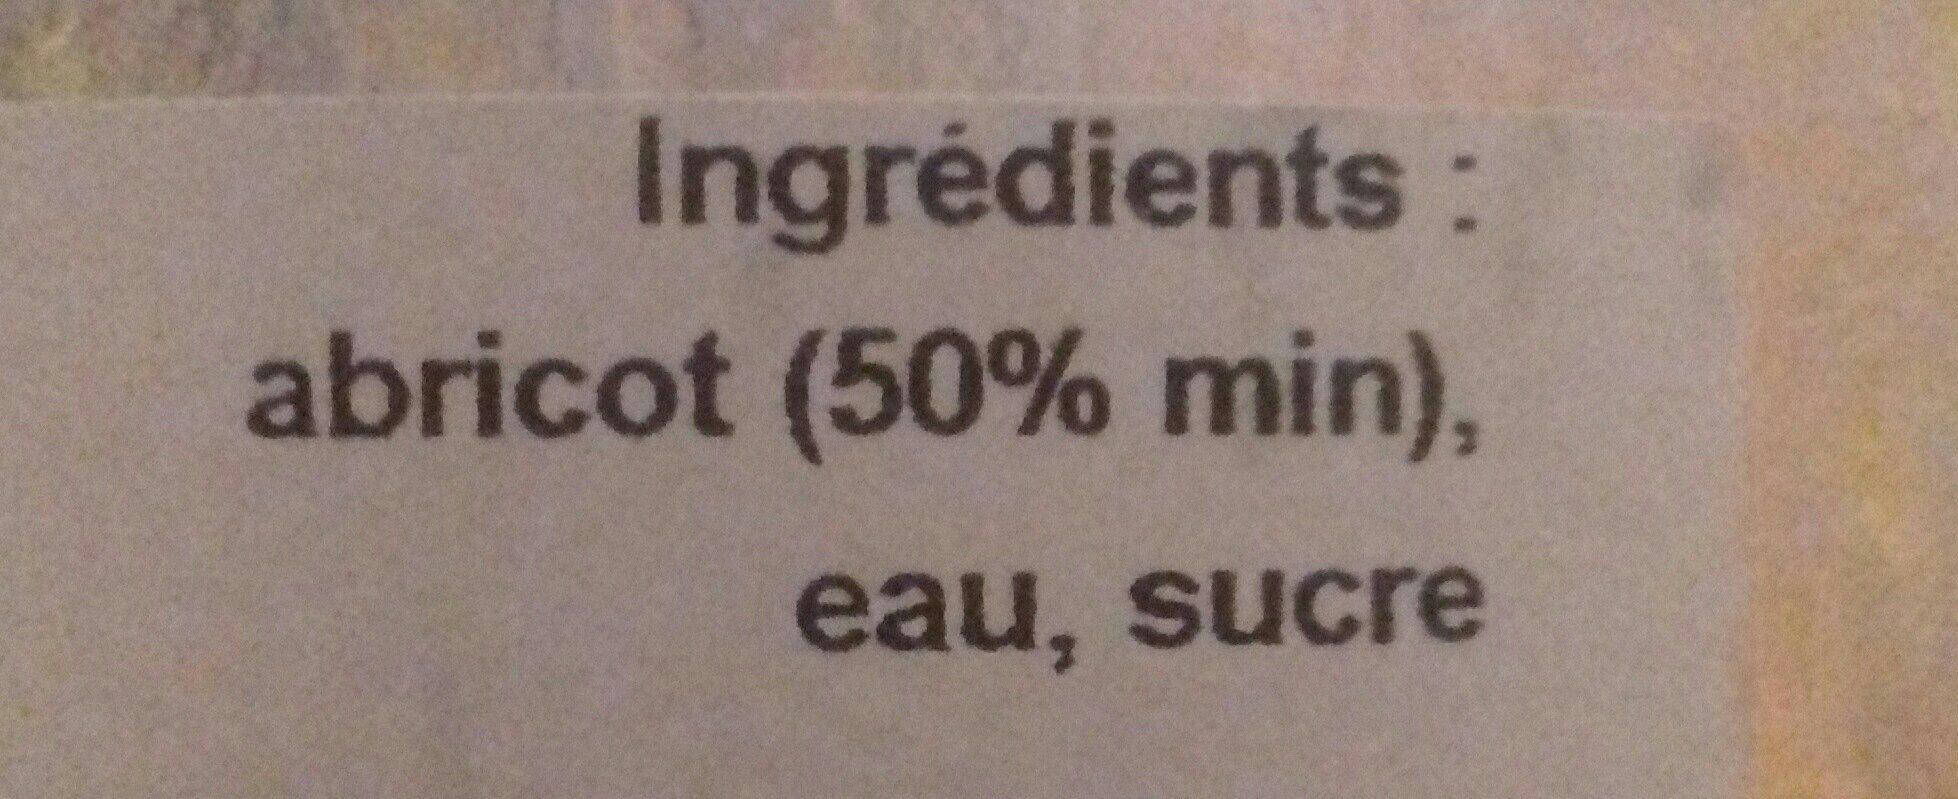 Nectar Abricot - Ingredients